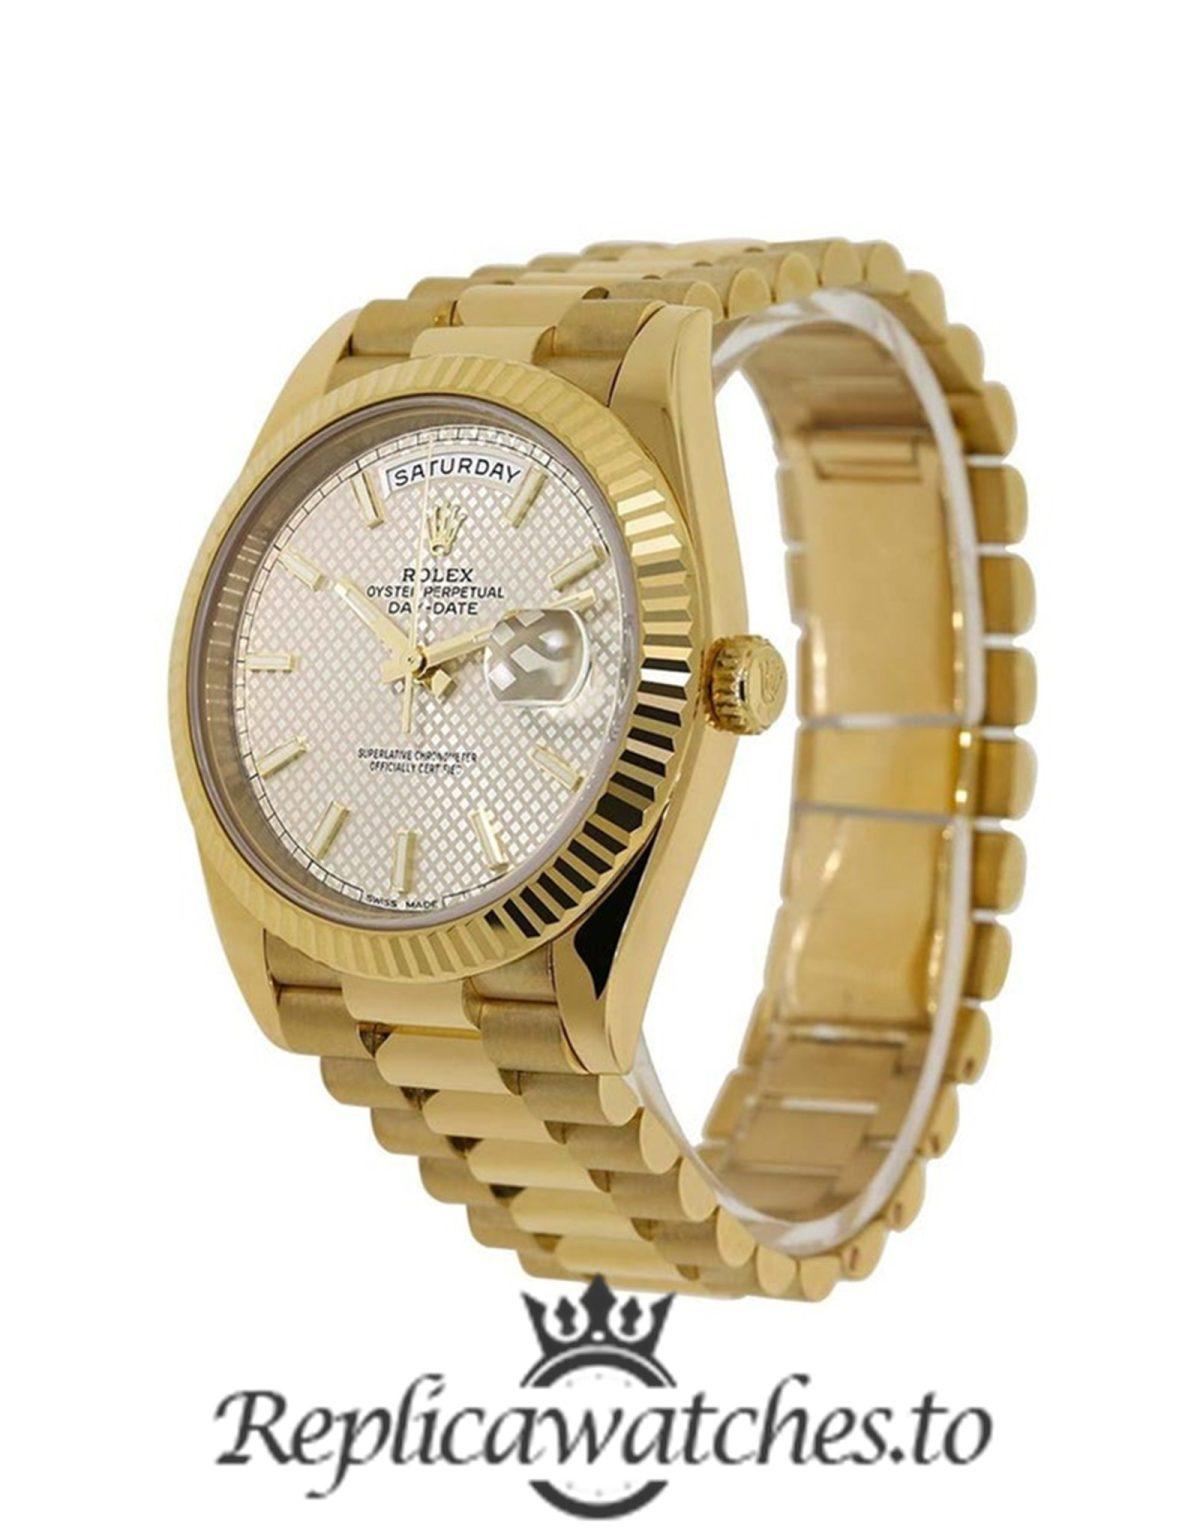 Rolex Day Date Replica 228238 004 Yellow Gold Strap 40MM